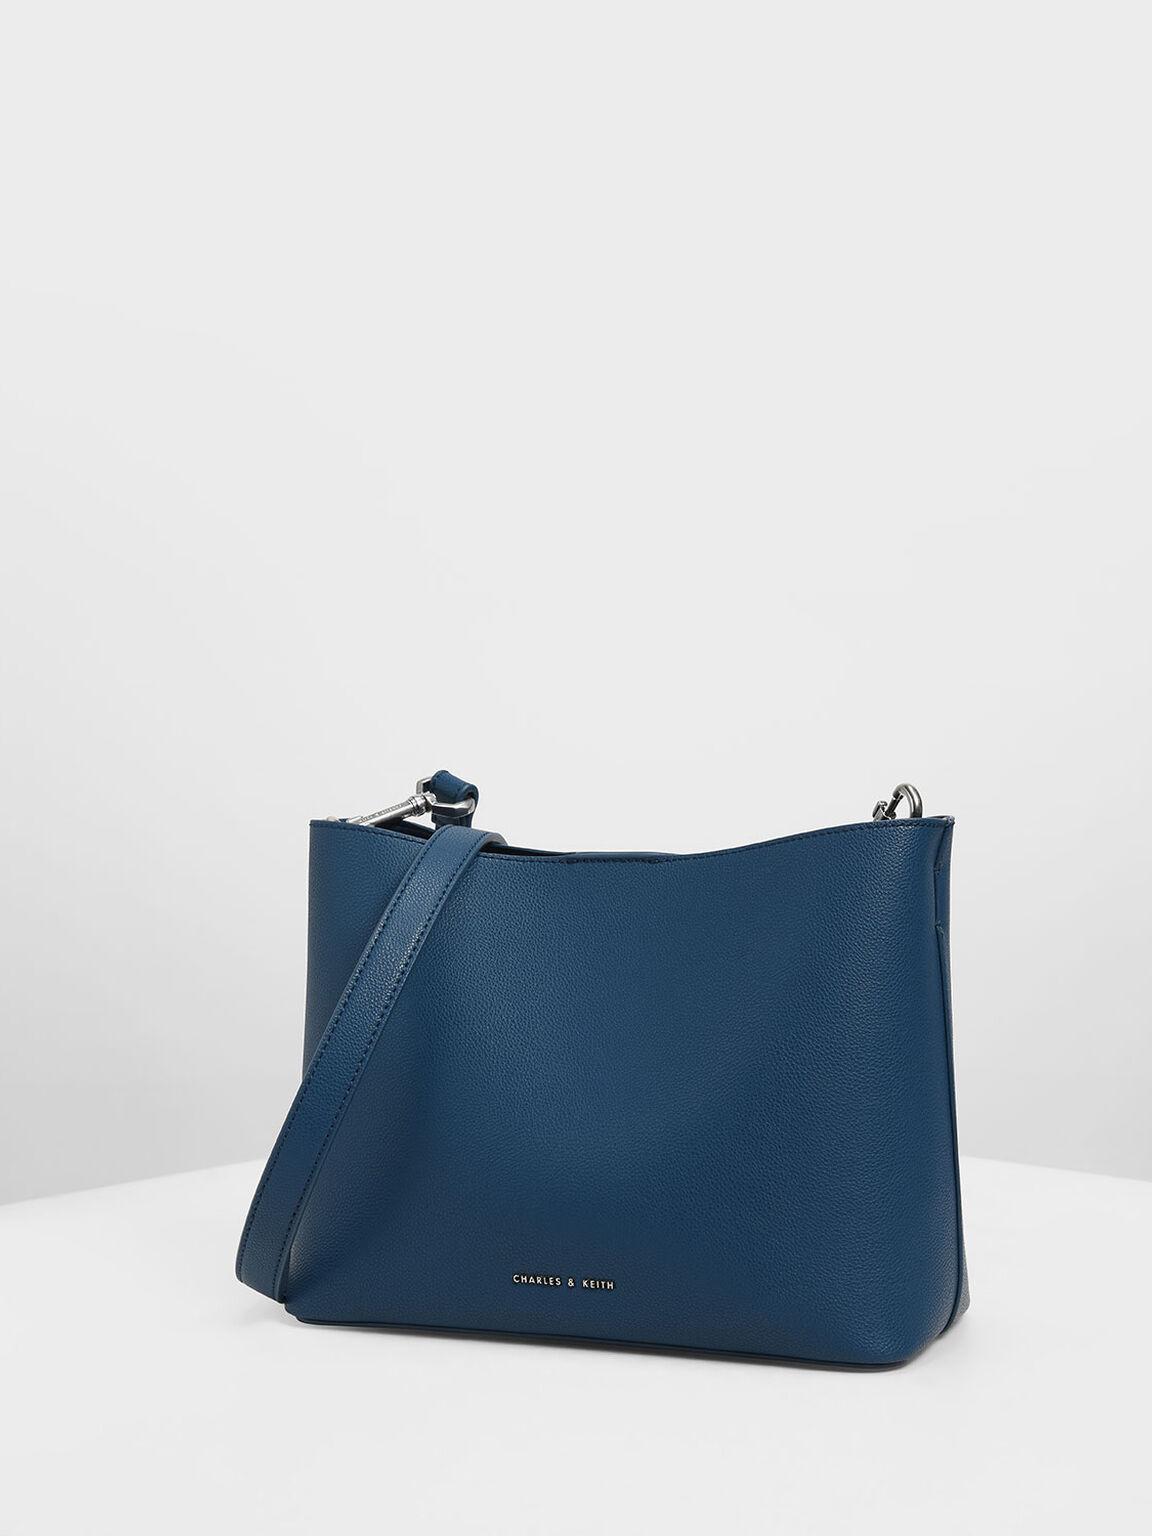 Chunky Chain Handle Bucket Bag, Dark Blue, hi-res